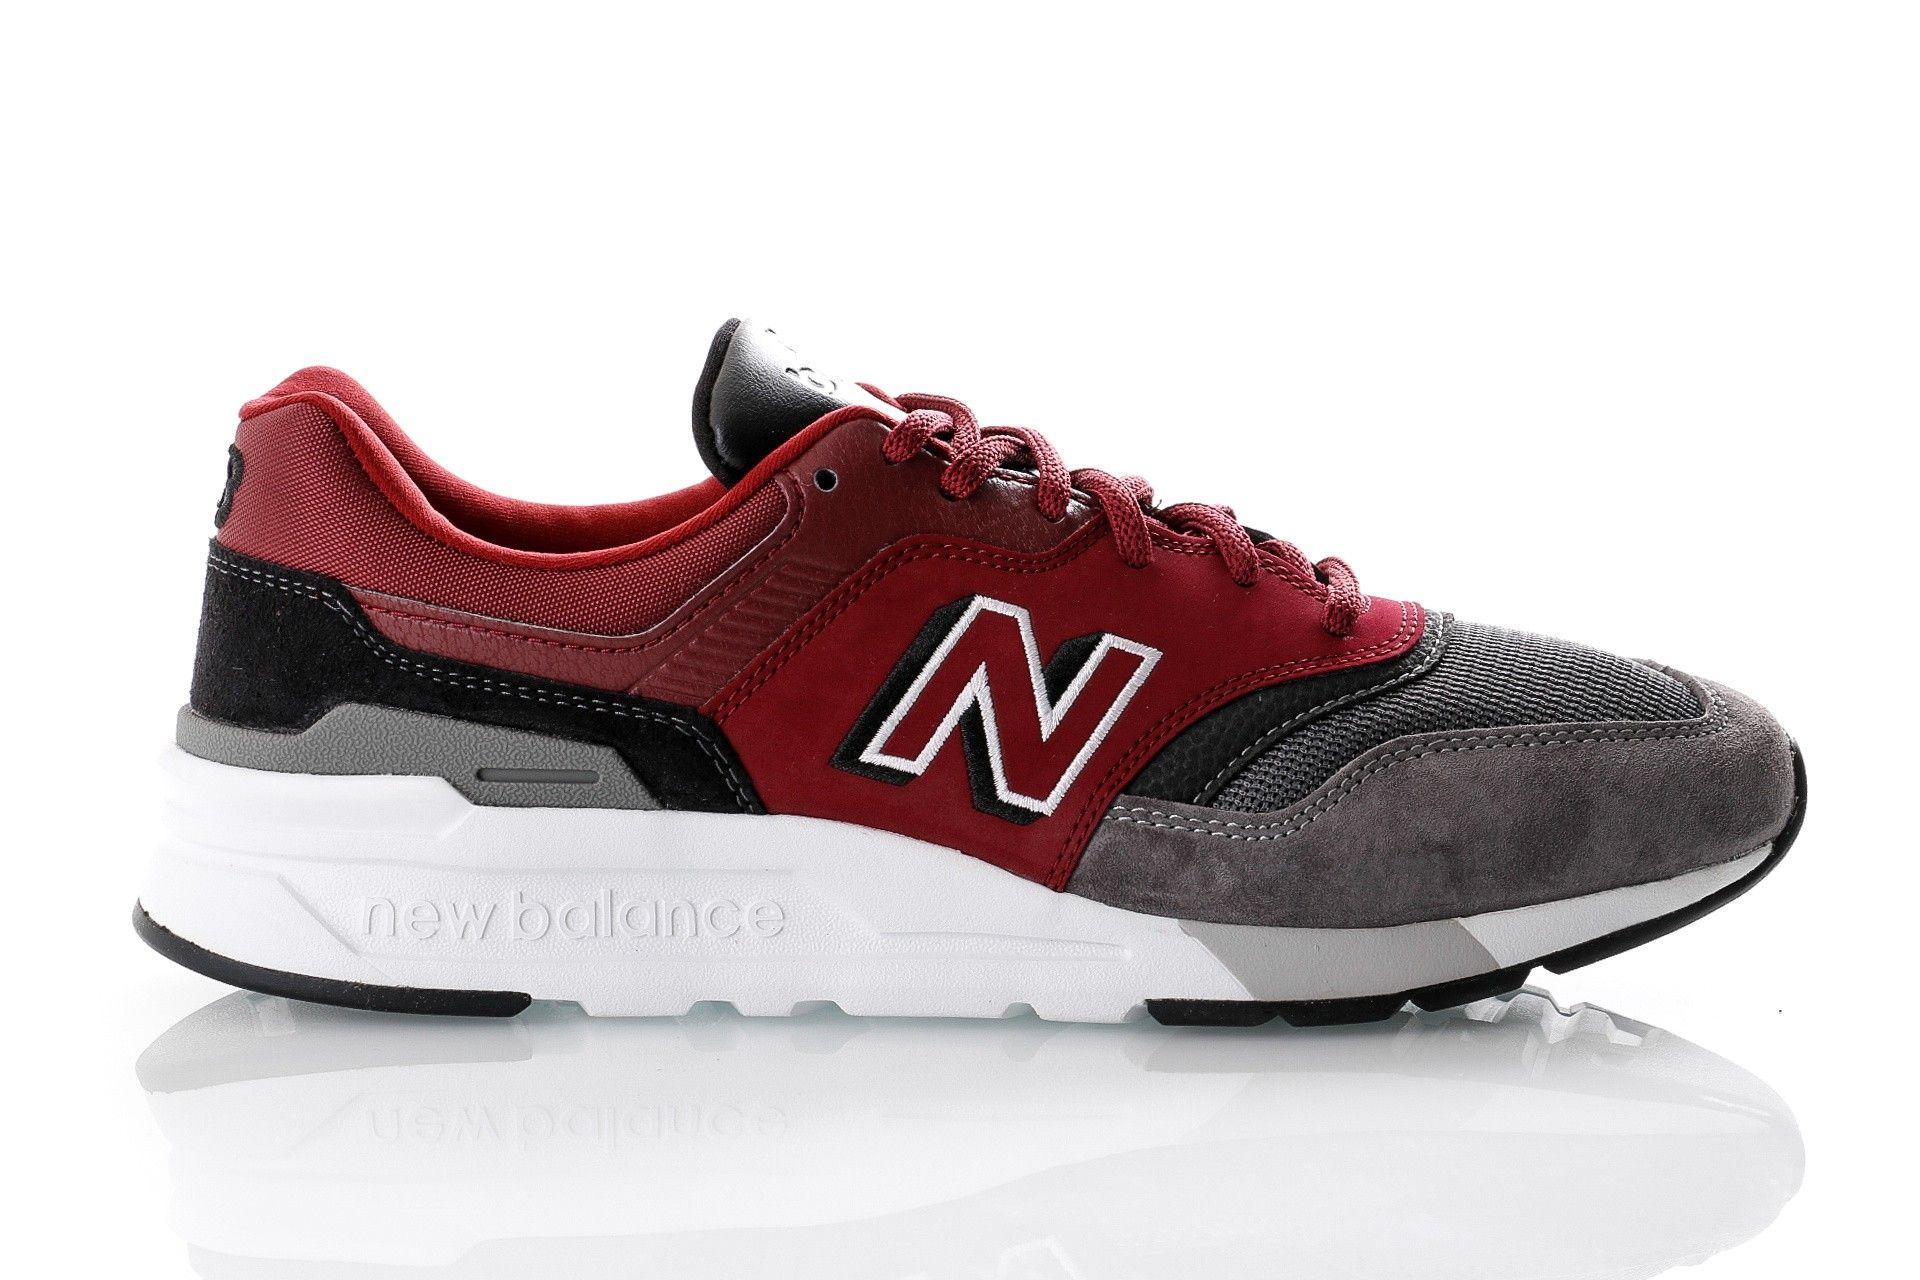 Afbeelding van New Balance Sneakers CM997HEL Red/Black (640) 774451-60